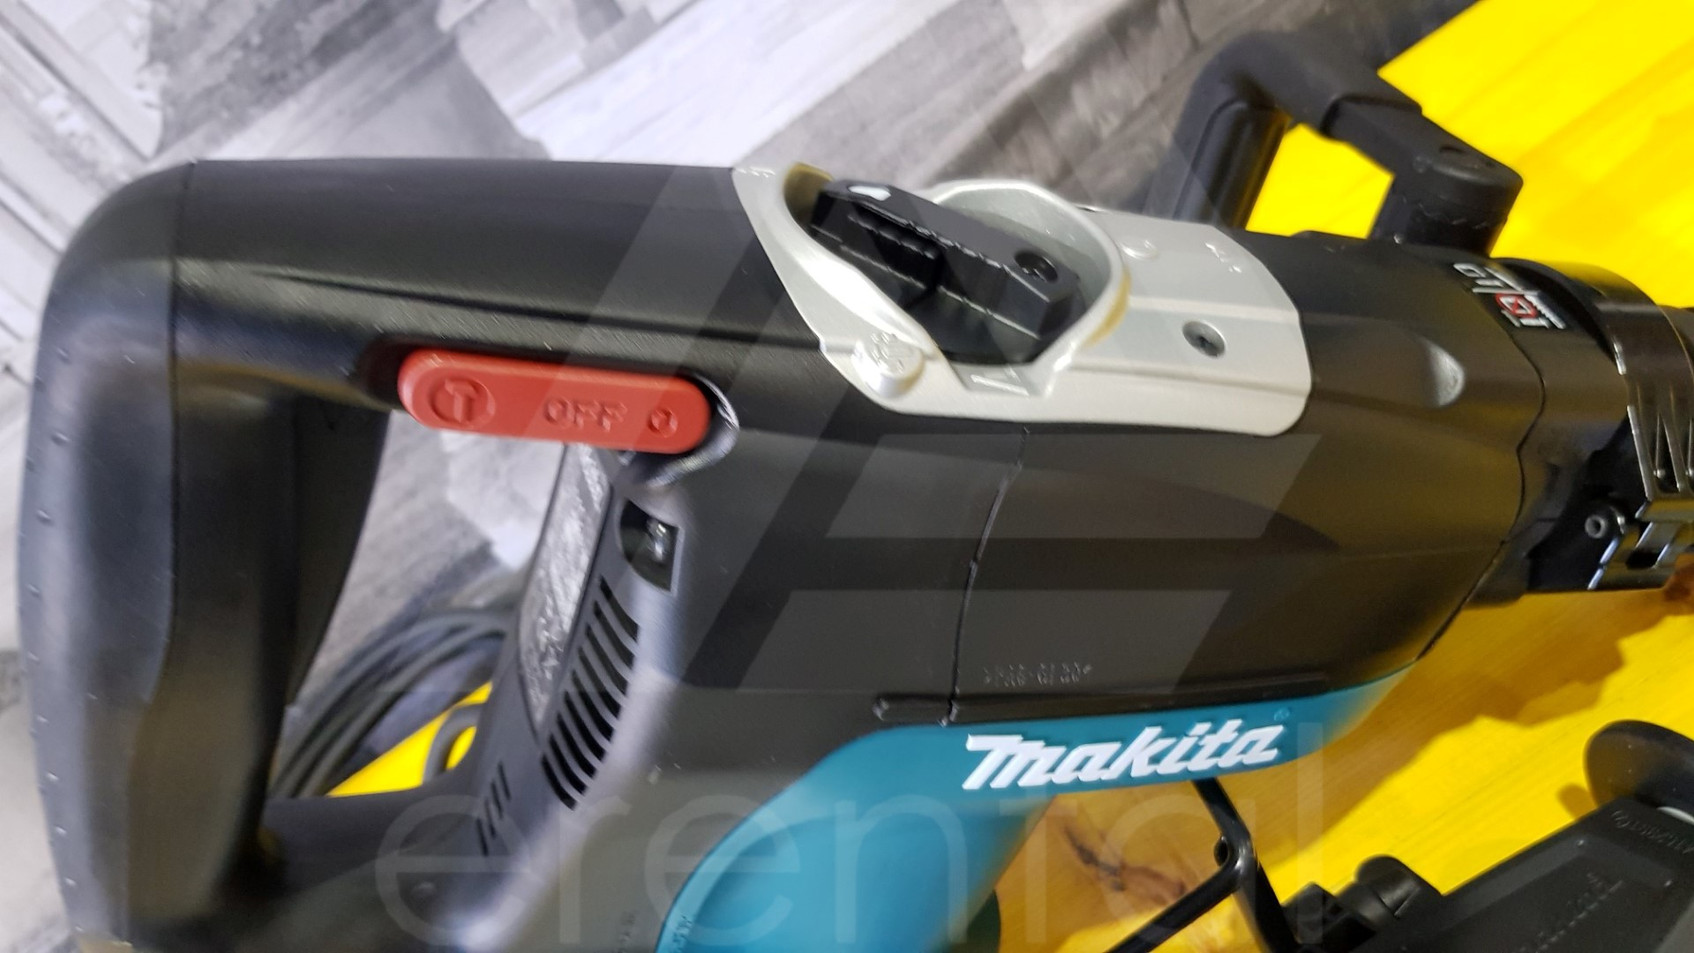 Martello demolitore MAKITA HR4001C